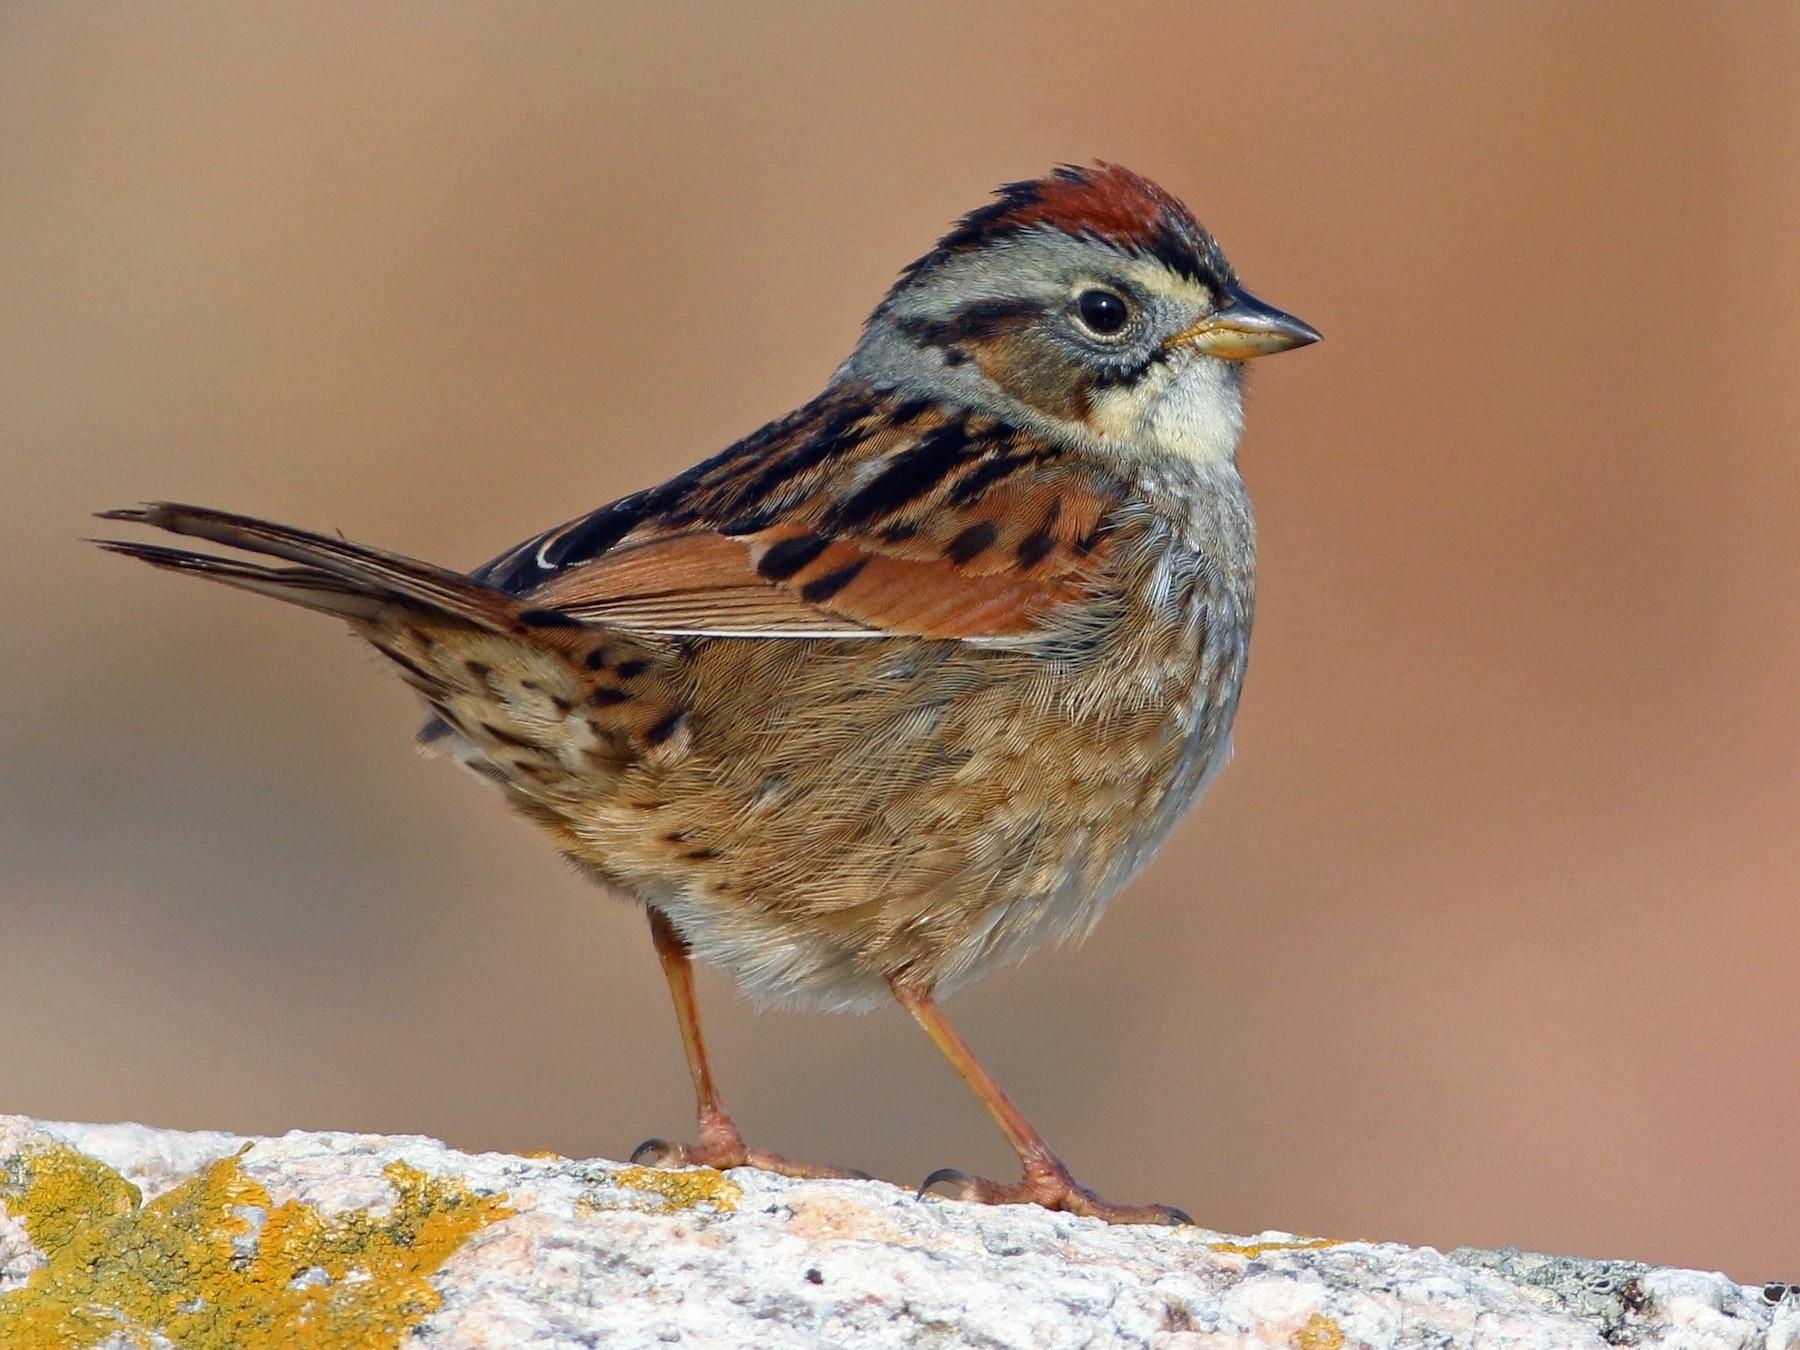 Swamp Sparrow - Keenan Yakola